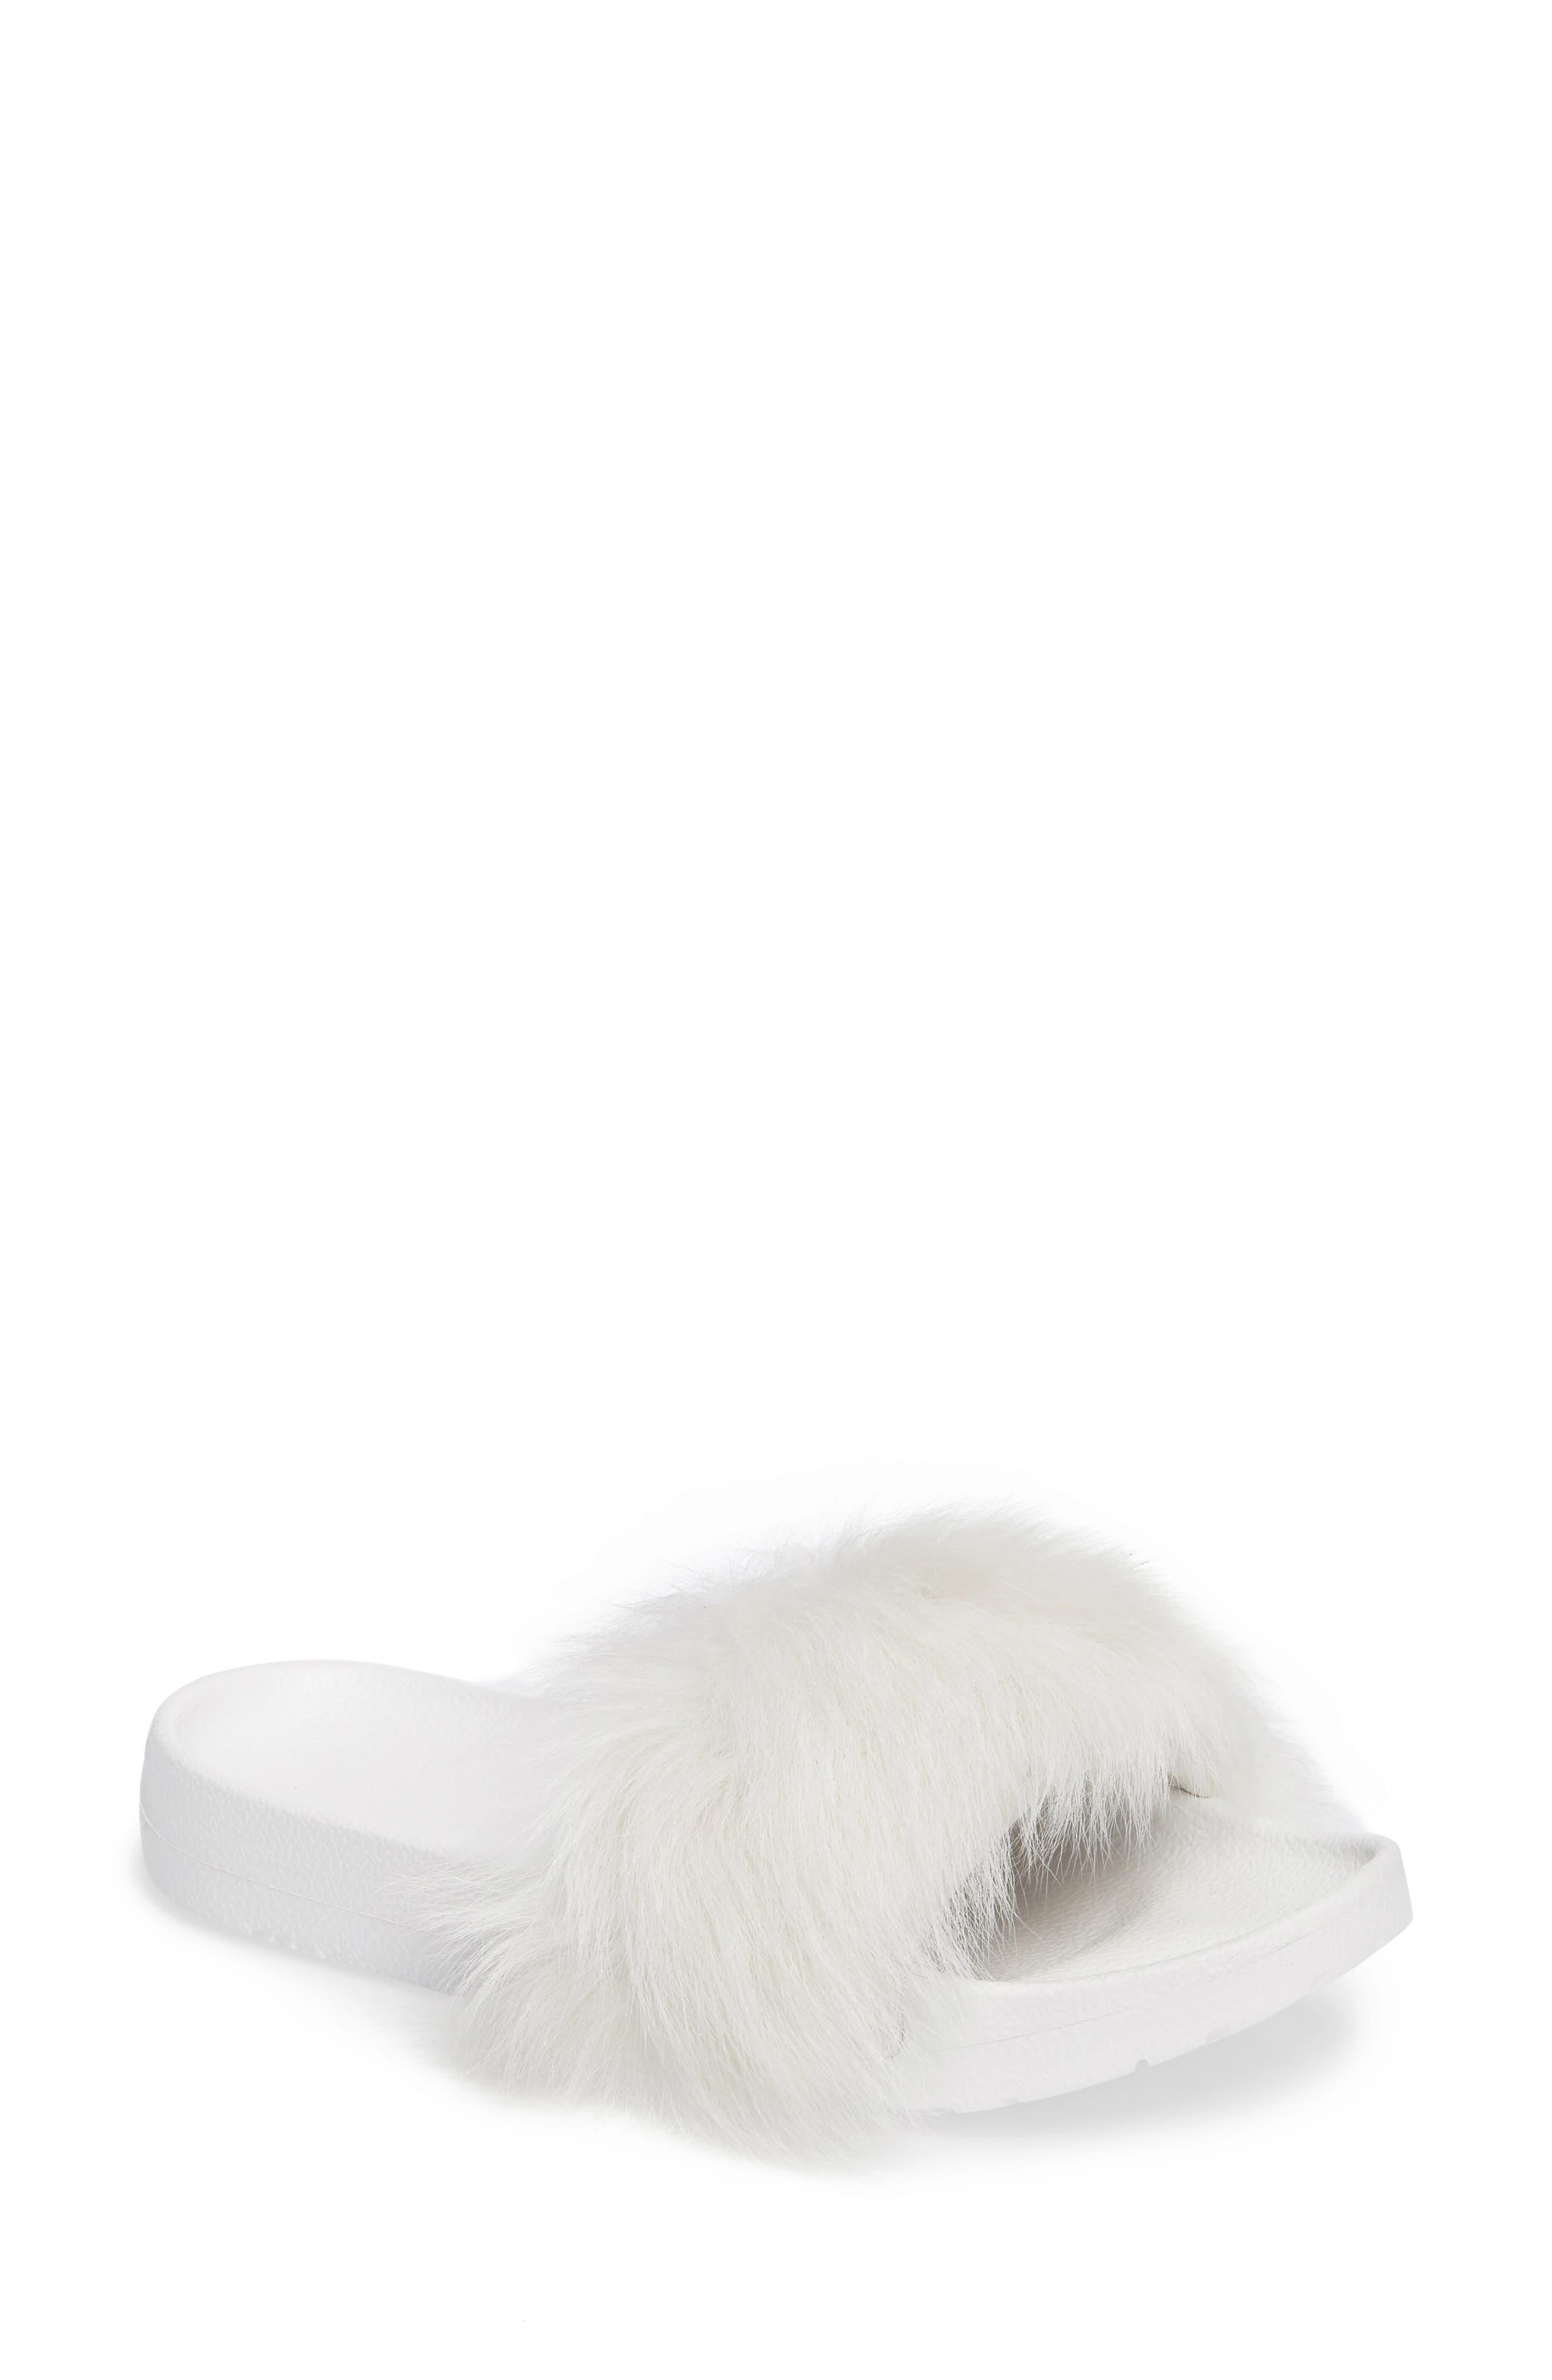 Main Image - UGG® Royale Genuine Shearling Slide Sandal (Women)